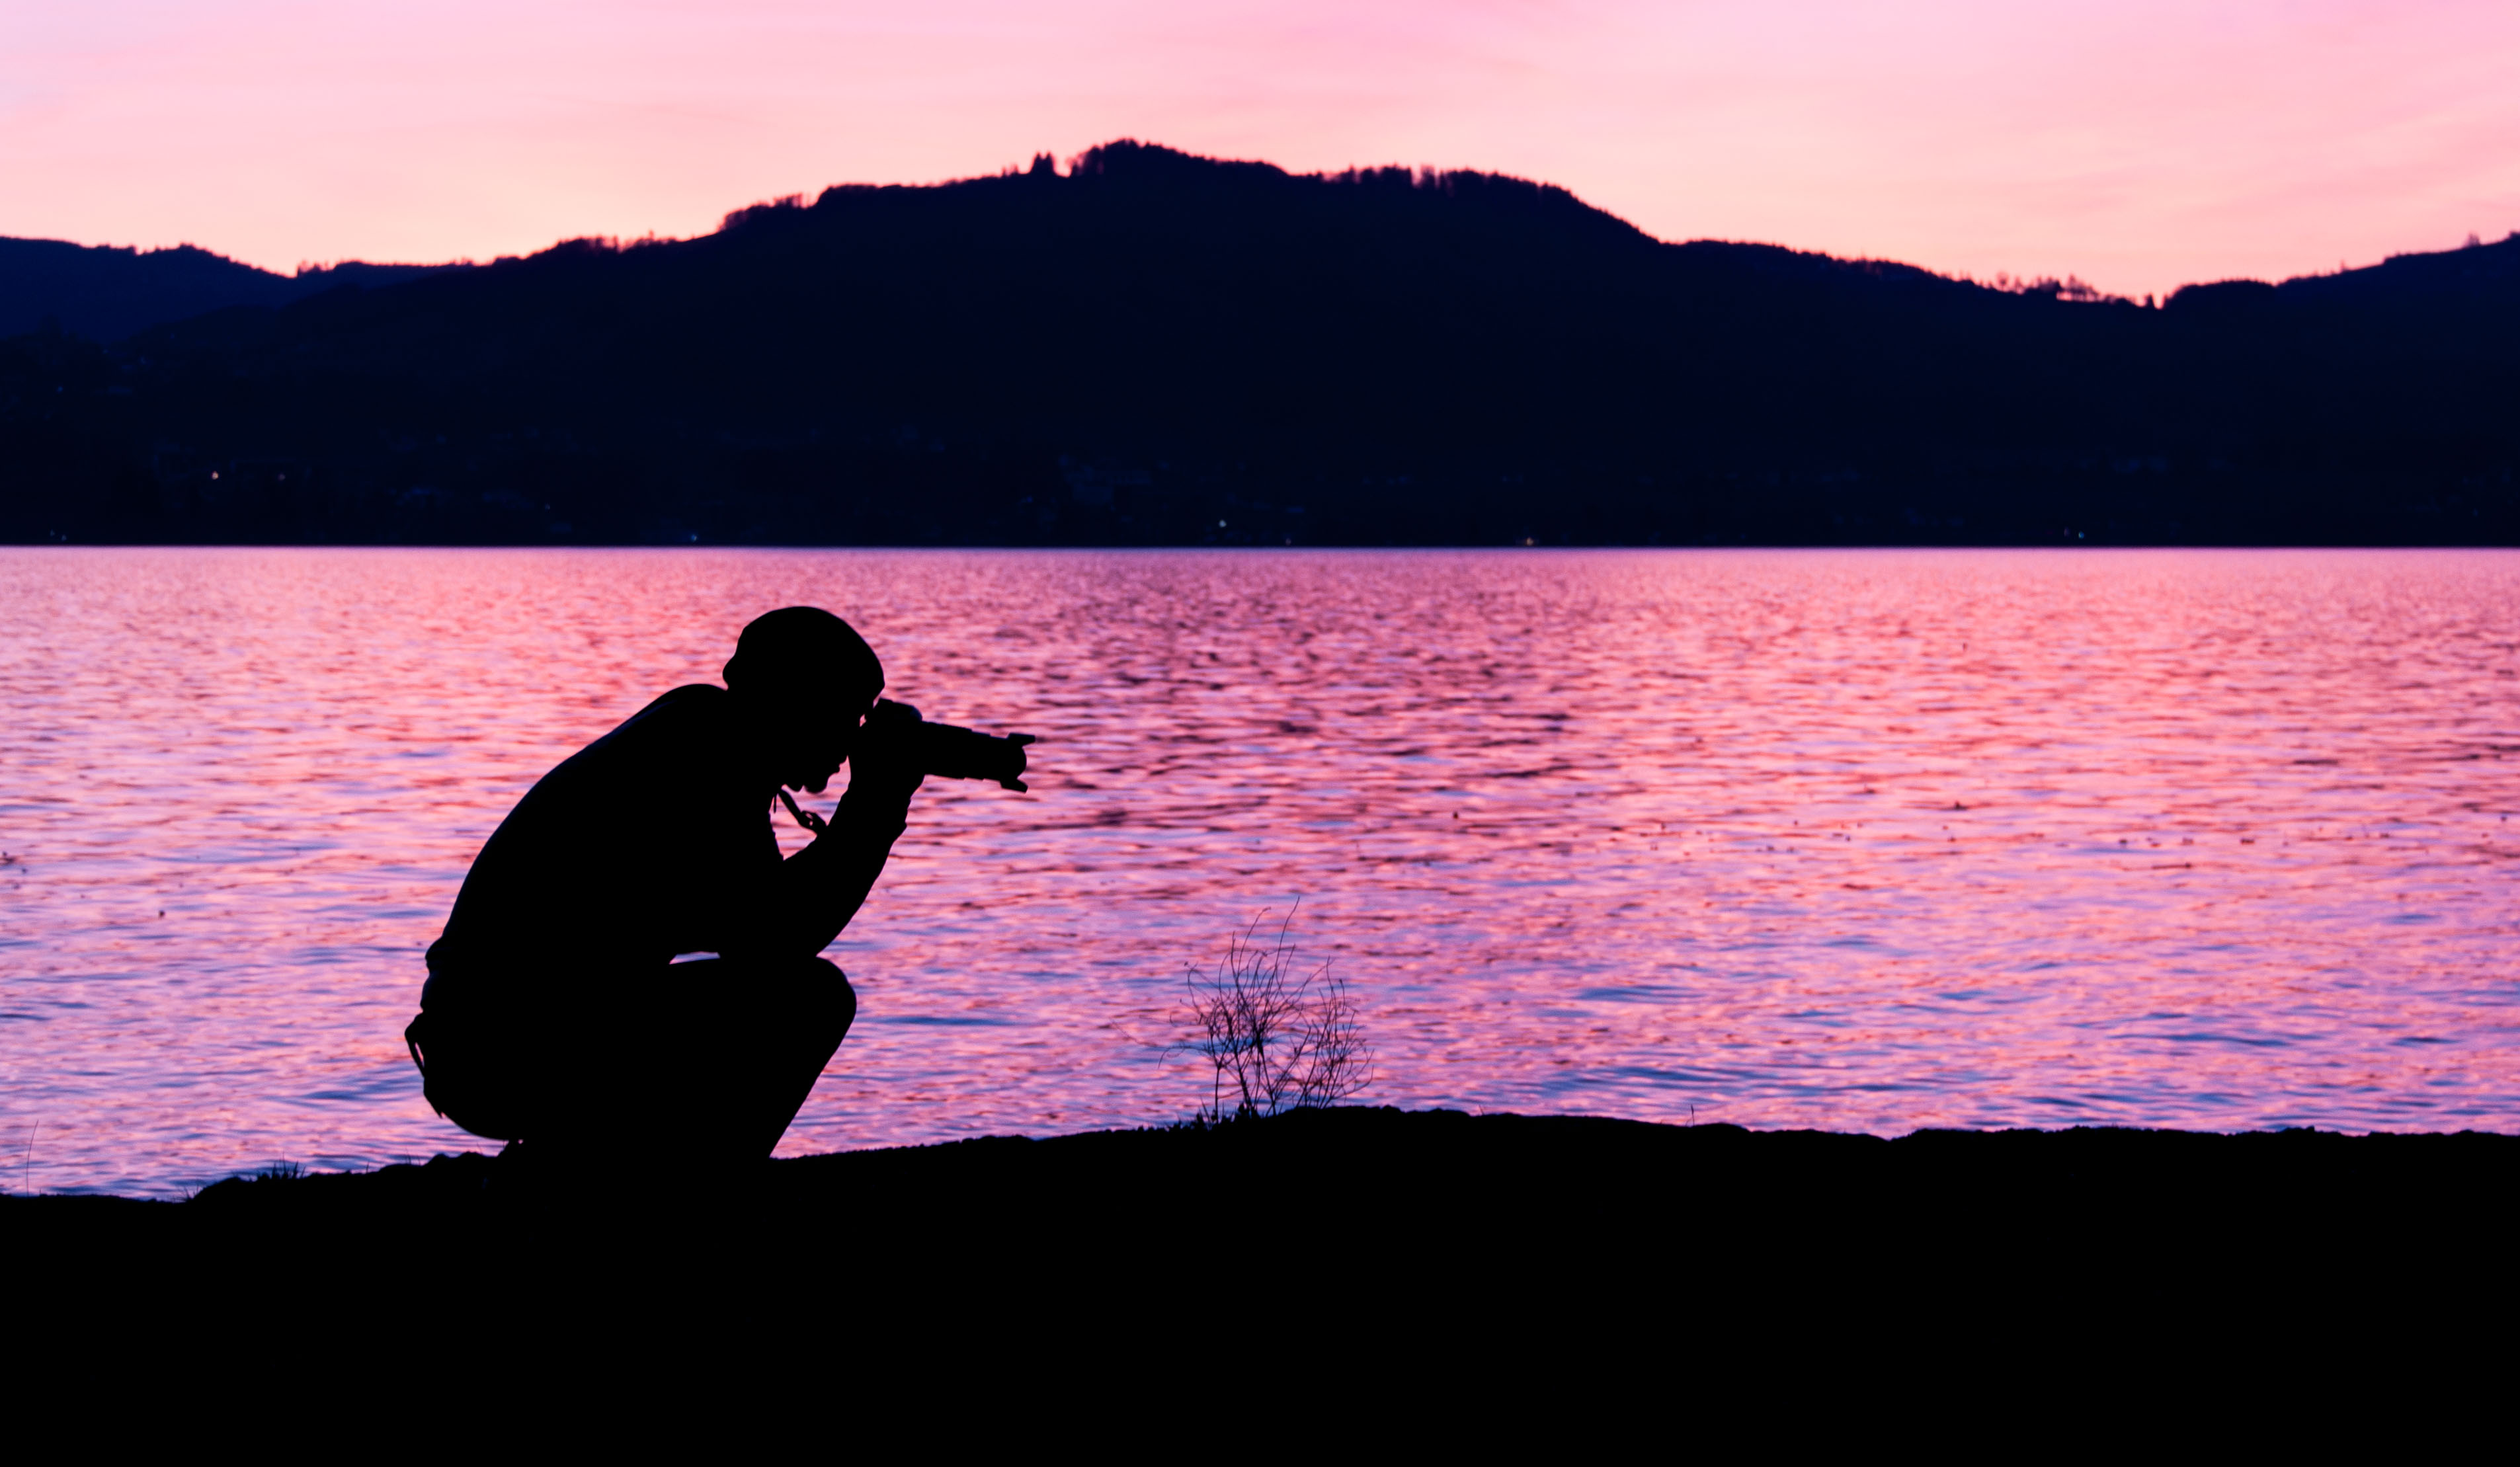 20170325Mike beim fotografieren im Sonnenuntergang